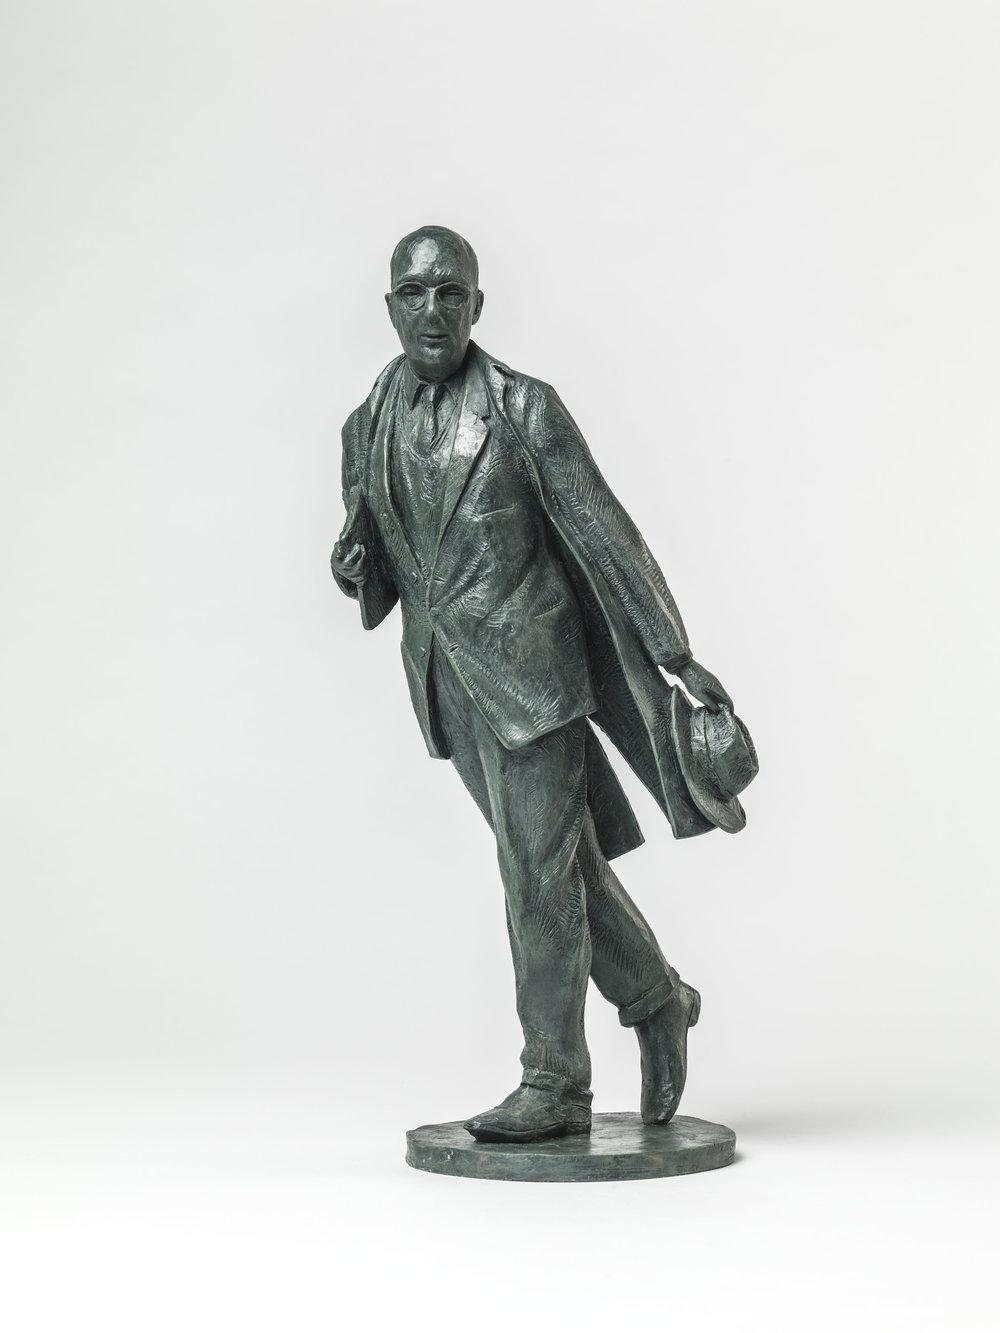 41. Philip Larkin maquette.